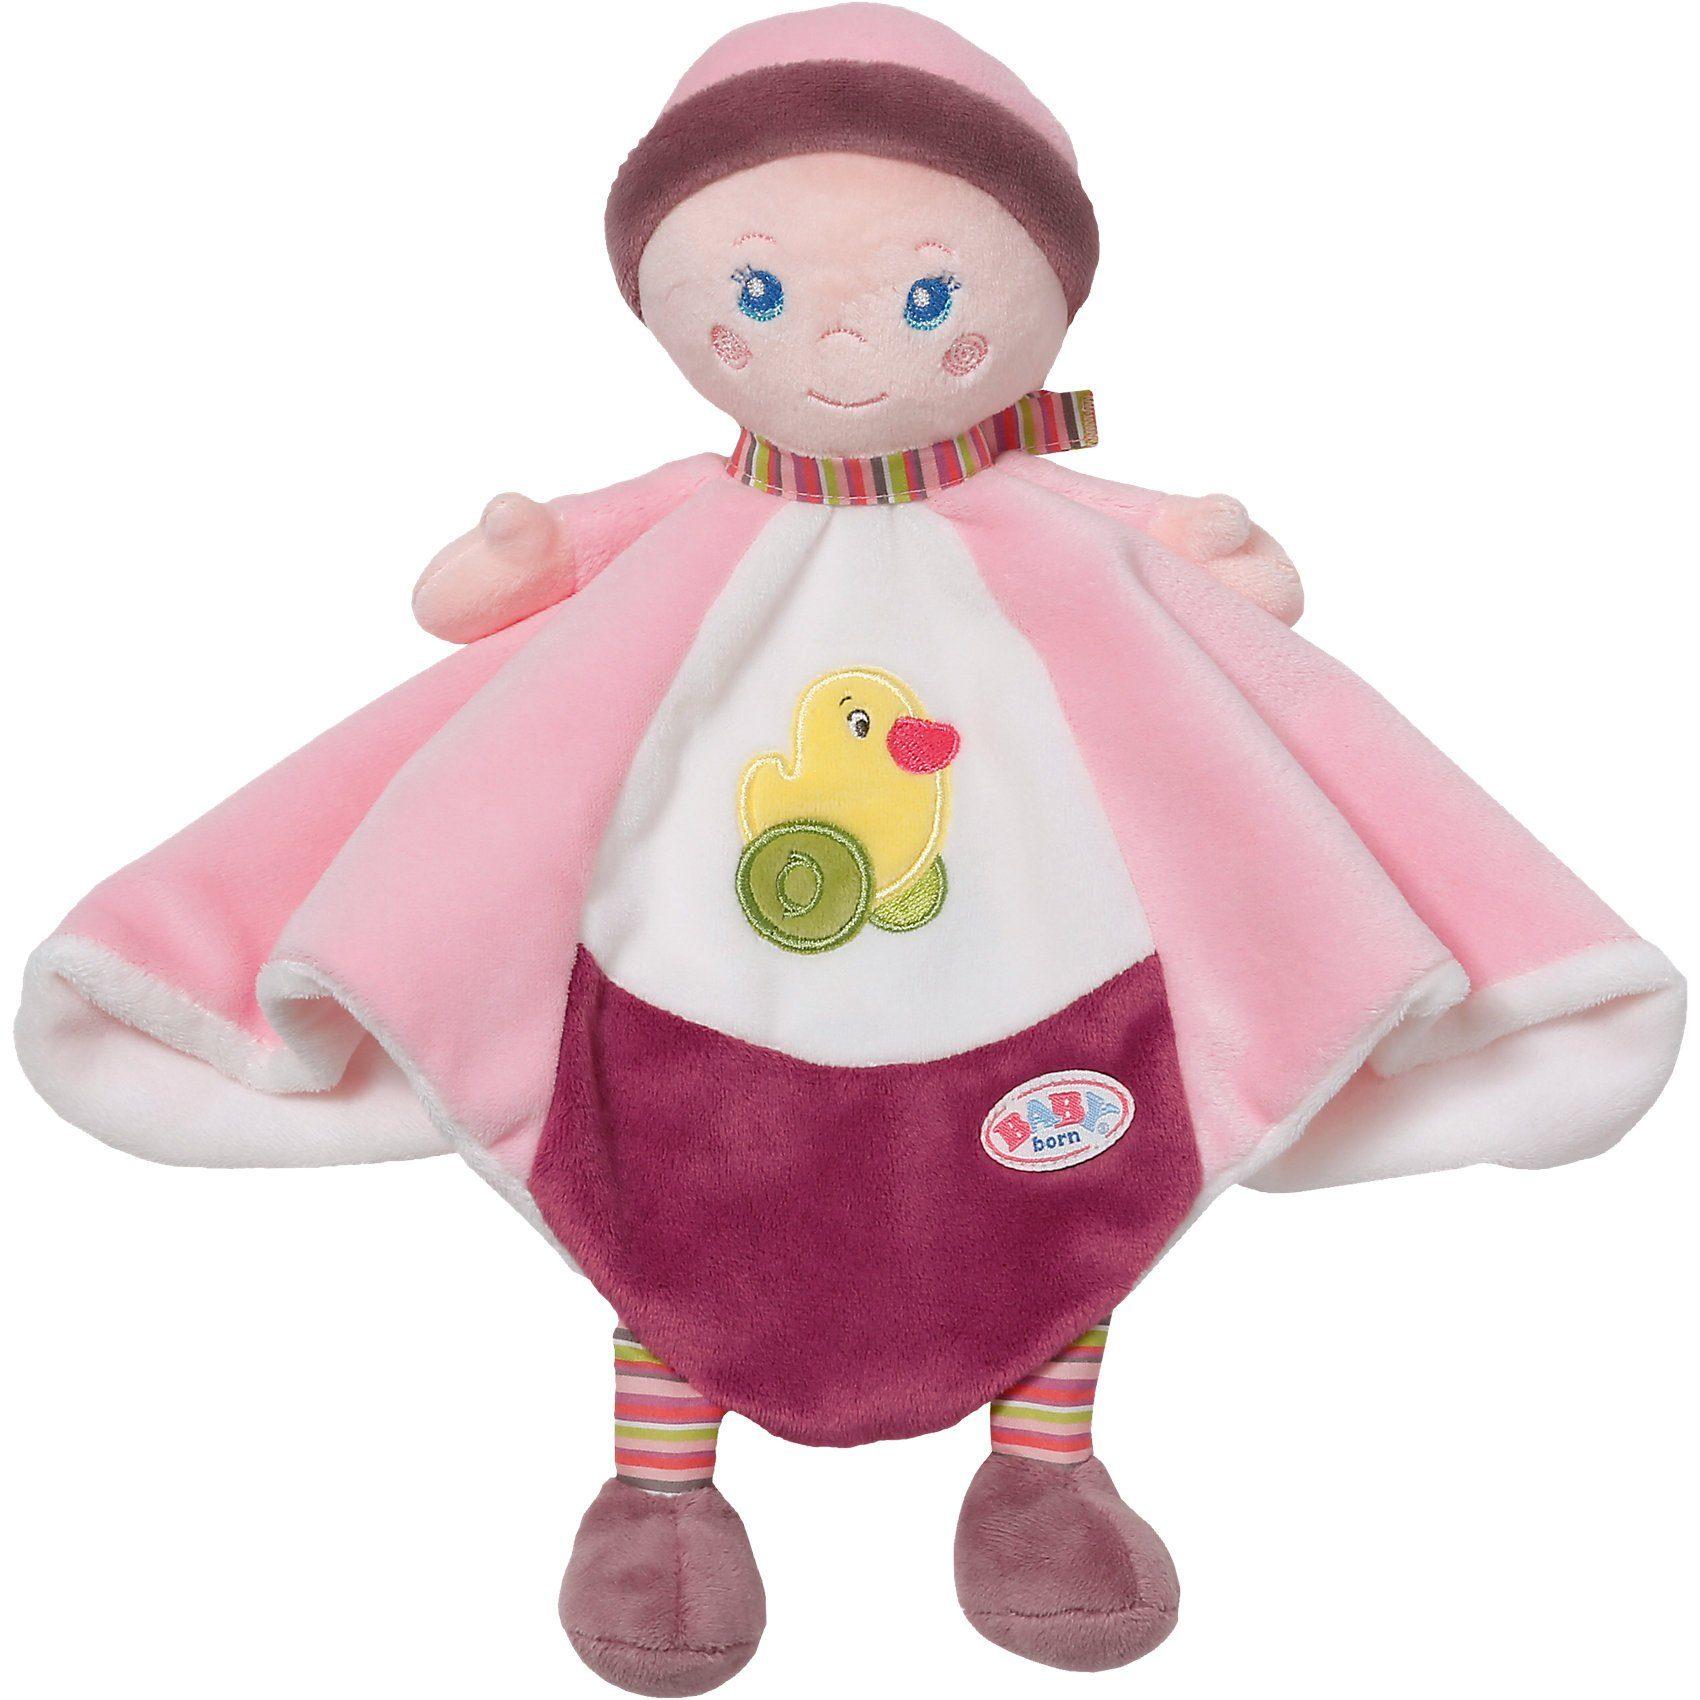 Zapf Creation BABY born® for babies Schmusetuch groß